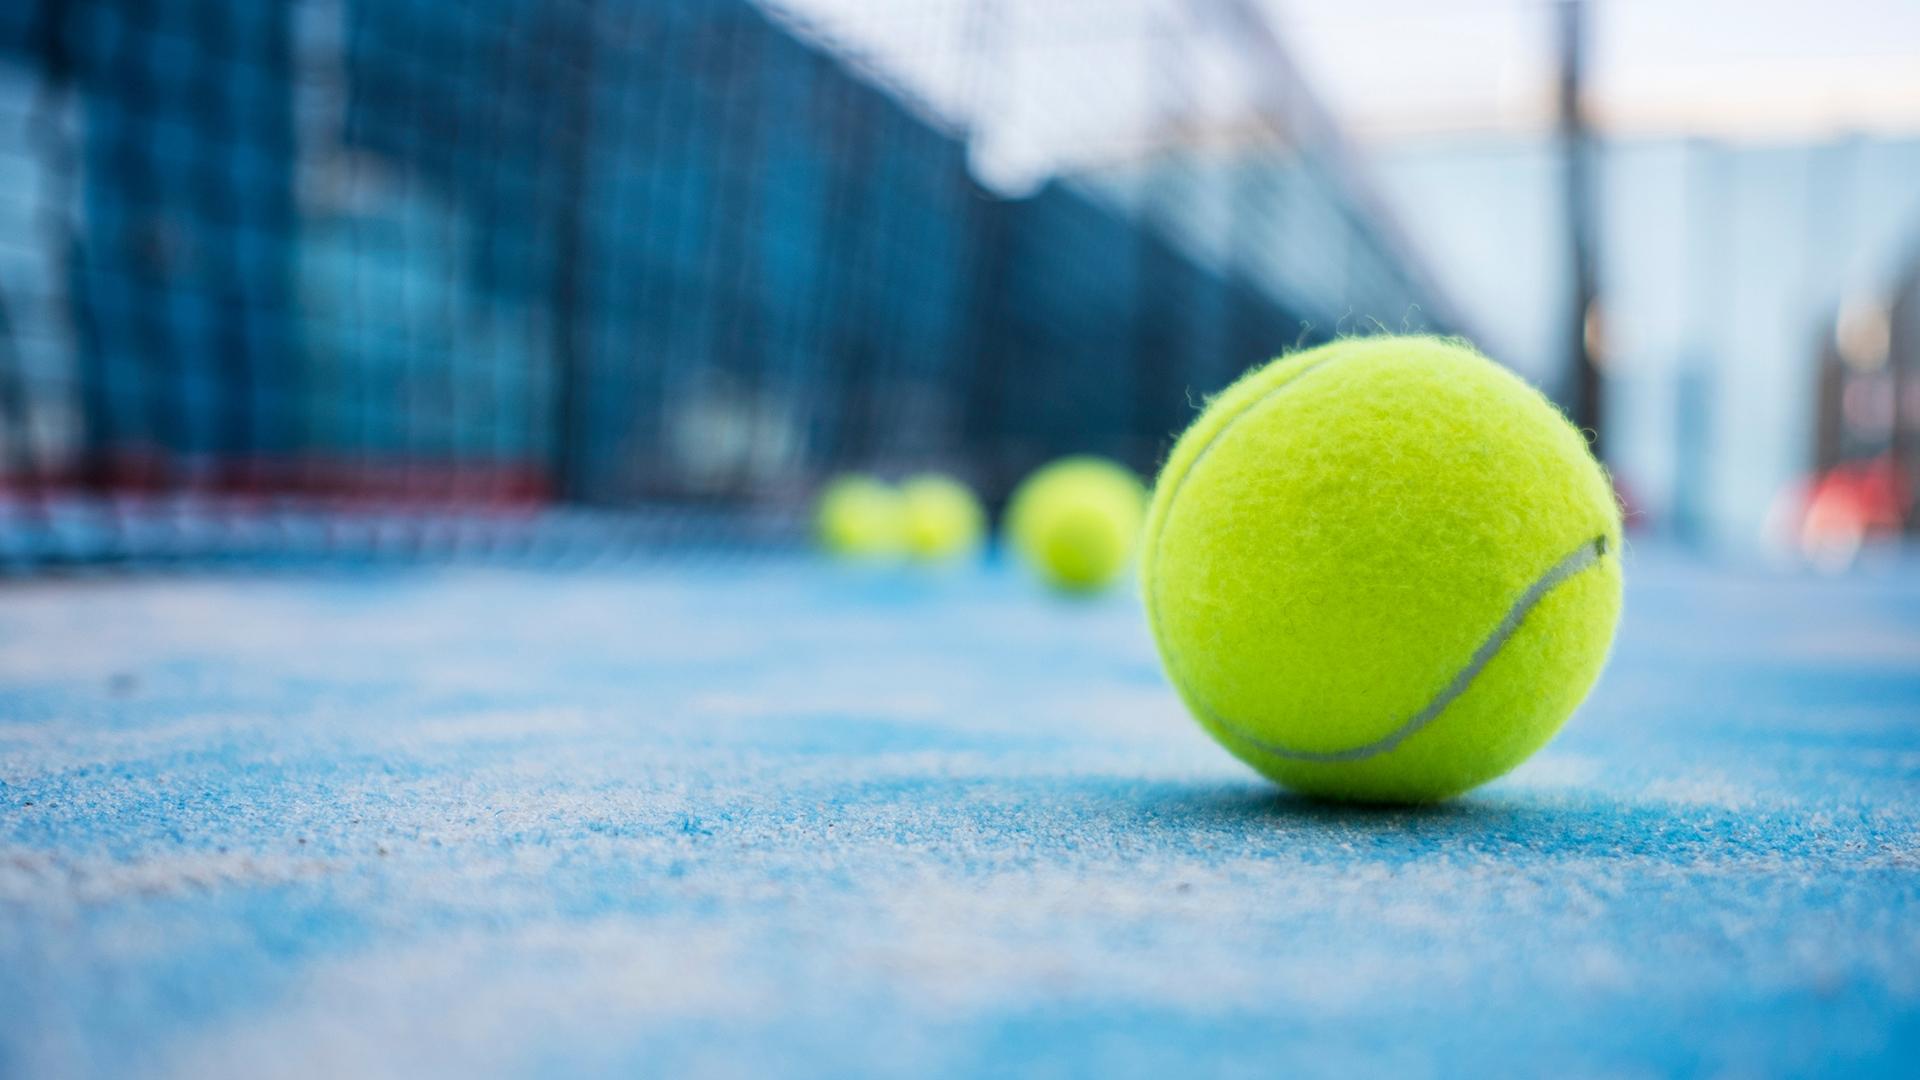 Venus Williams vs. Anna-Karolina Schmiedlova